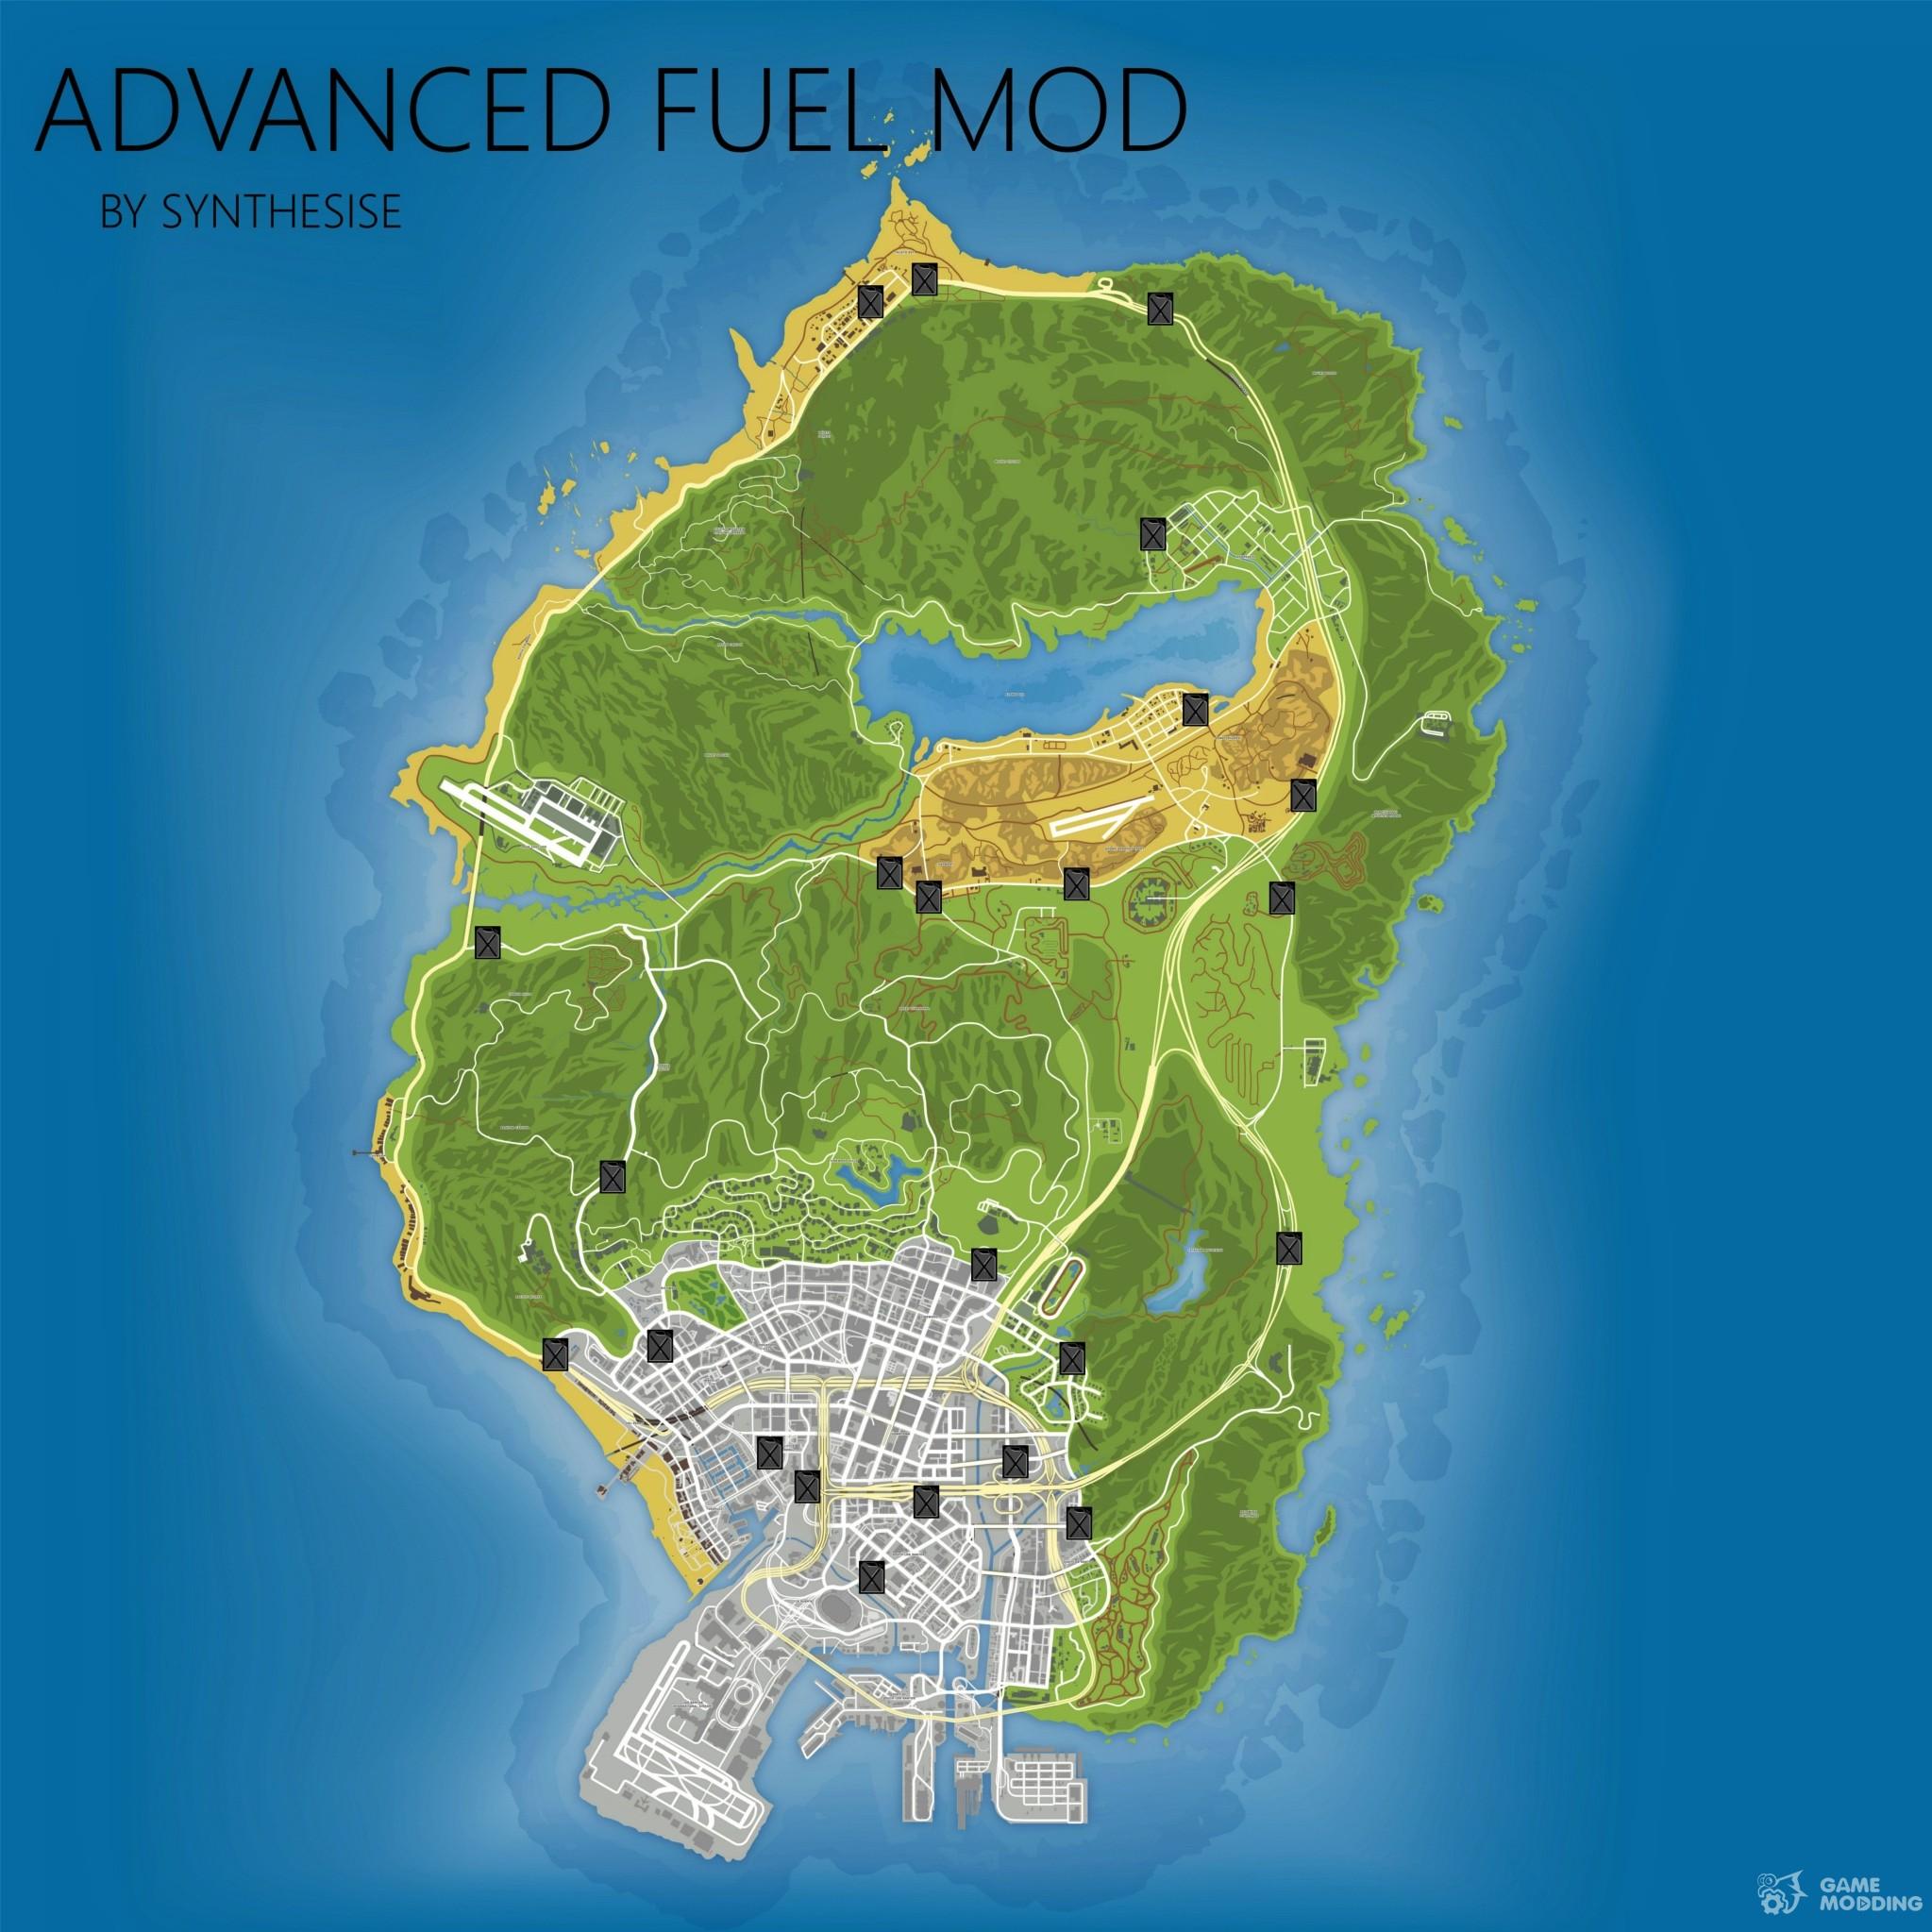 Advanced Fuel Mod 1 3 for GTA 5